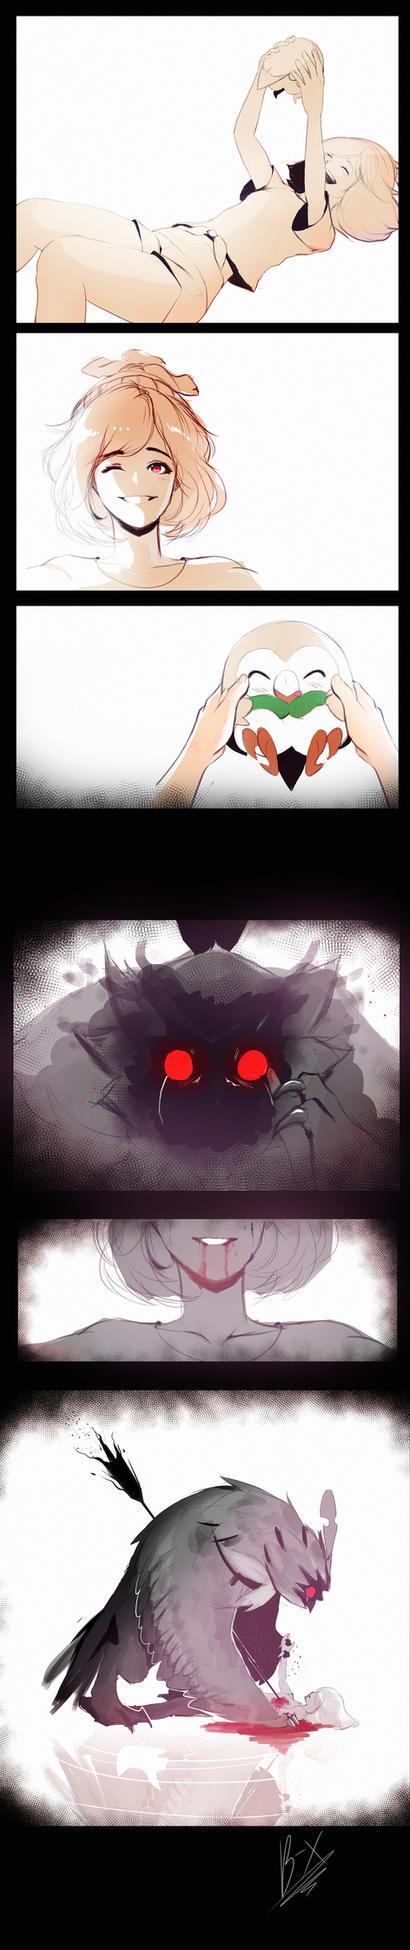 Pokemon Sun and Moon: Spirit Shackle by Billiam-X